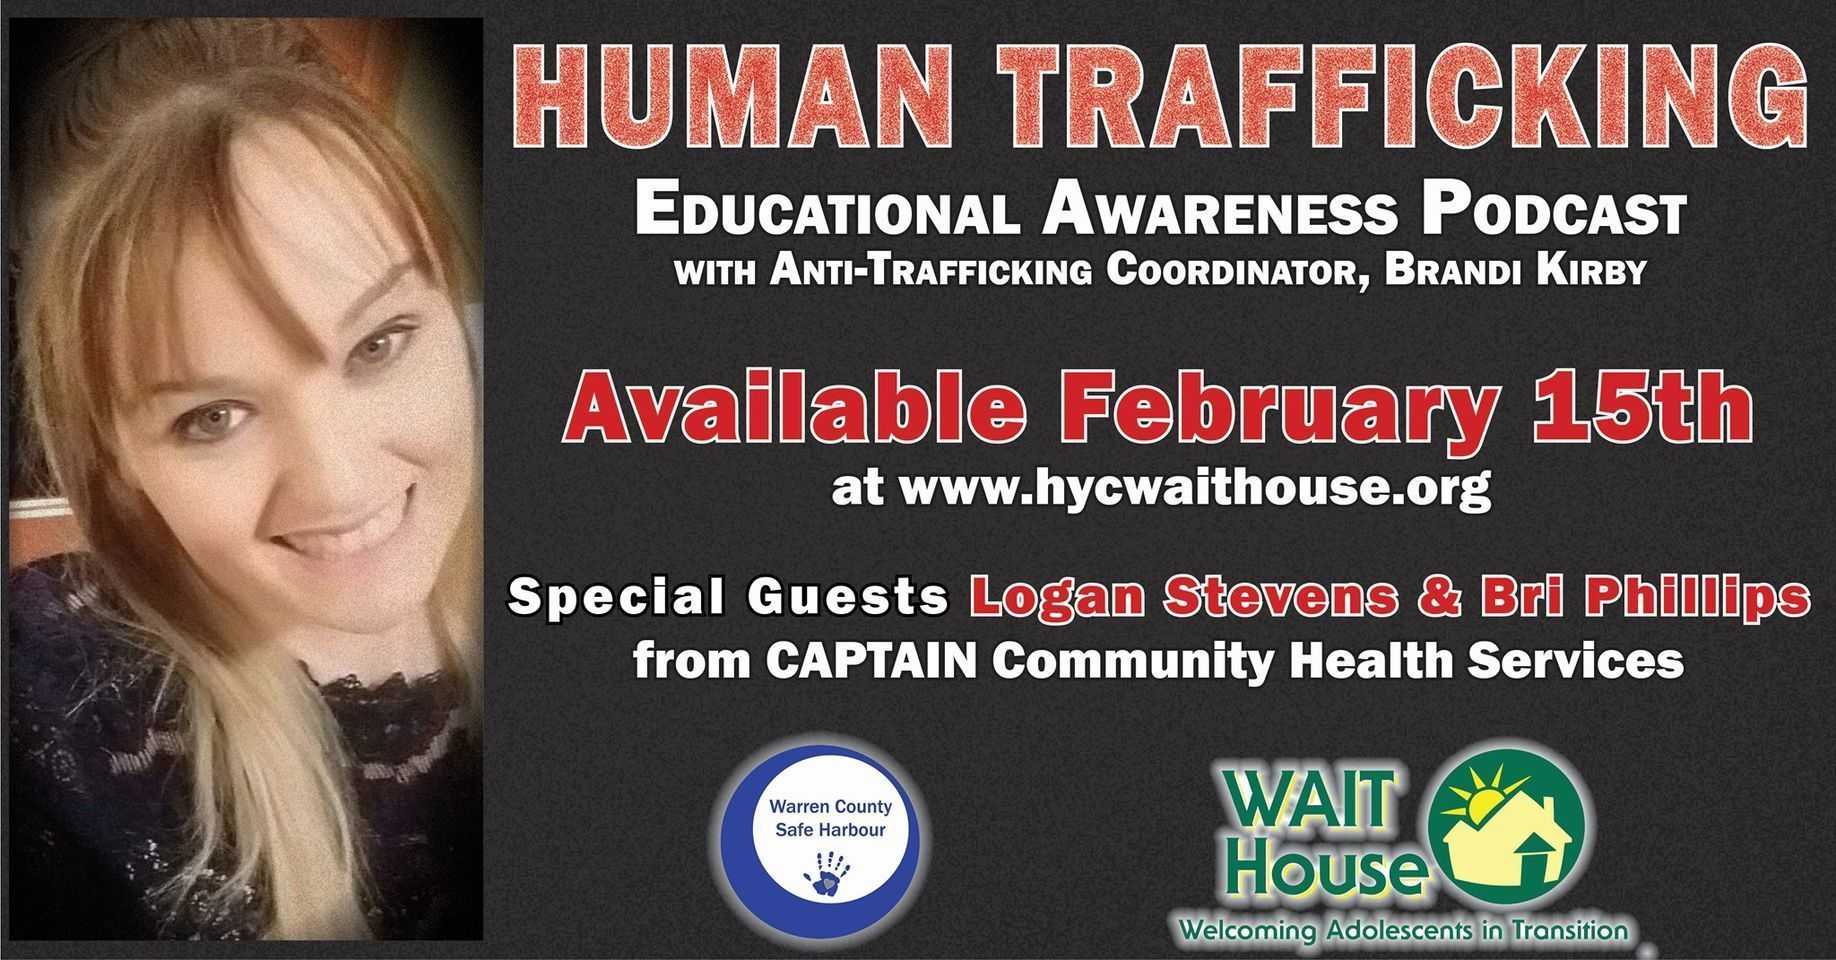 PODCAST: Human Trafficking Educational Awareness (Courtesy of Wait House)